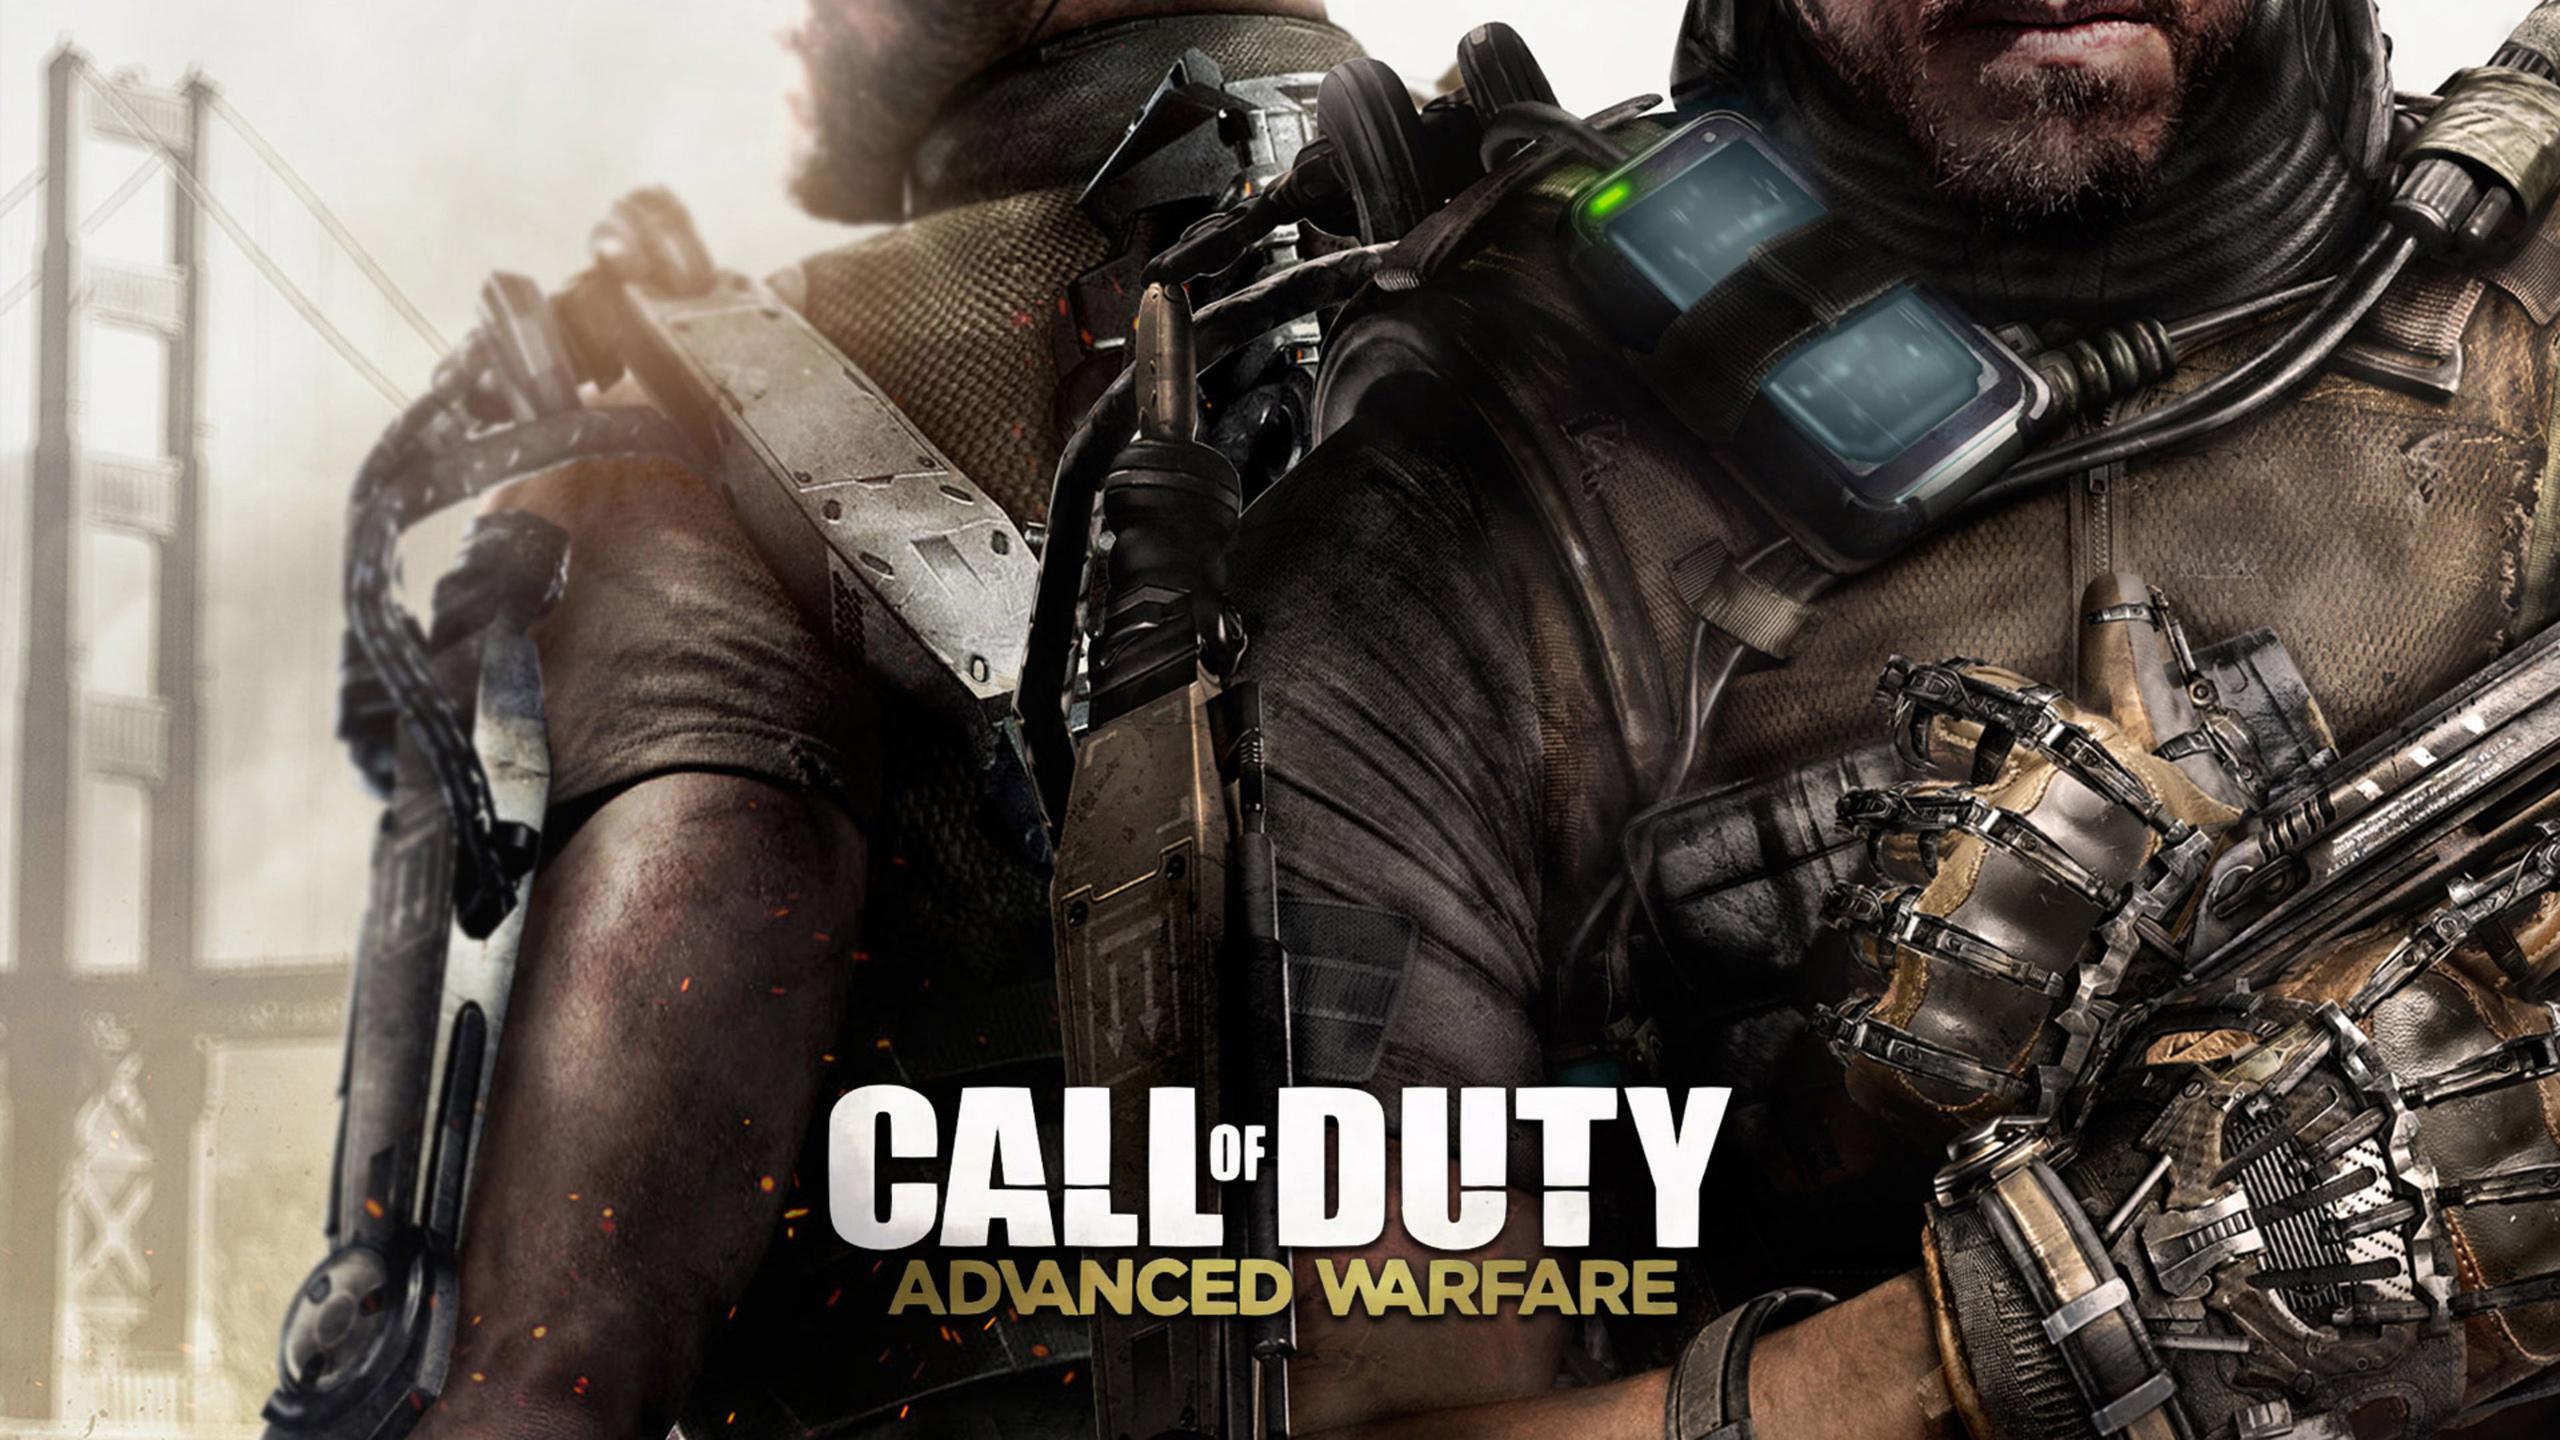 Call Of Duty Advanced Warfare 2014 HD Wallpapers 2560x1440